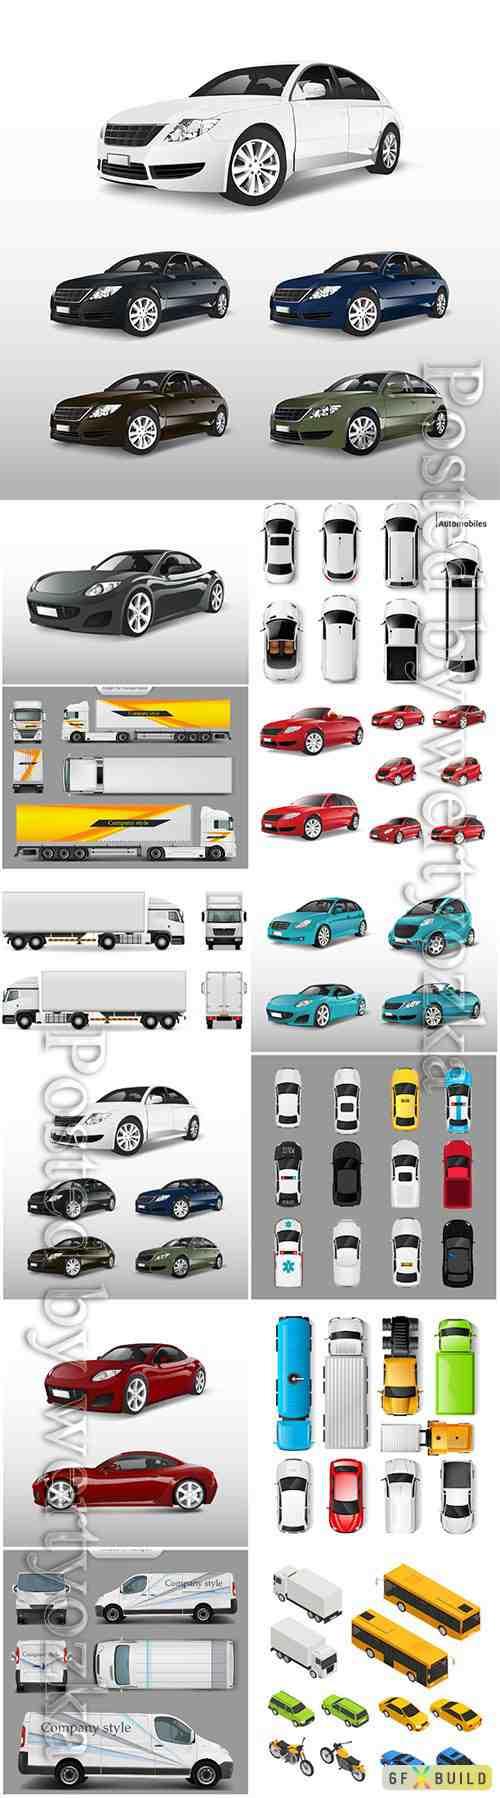 Cars various models vector